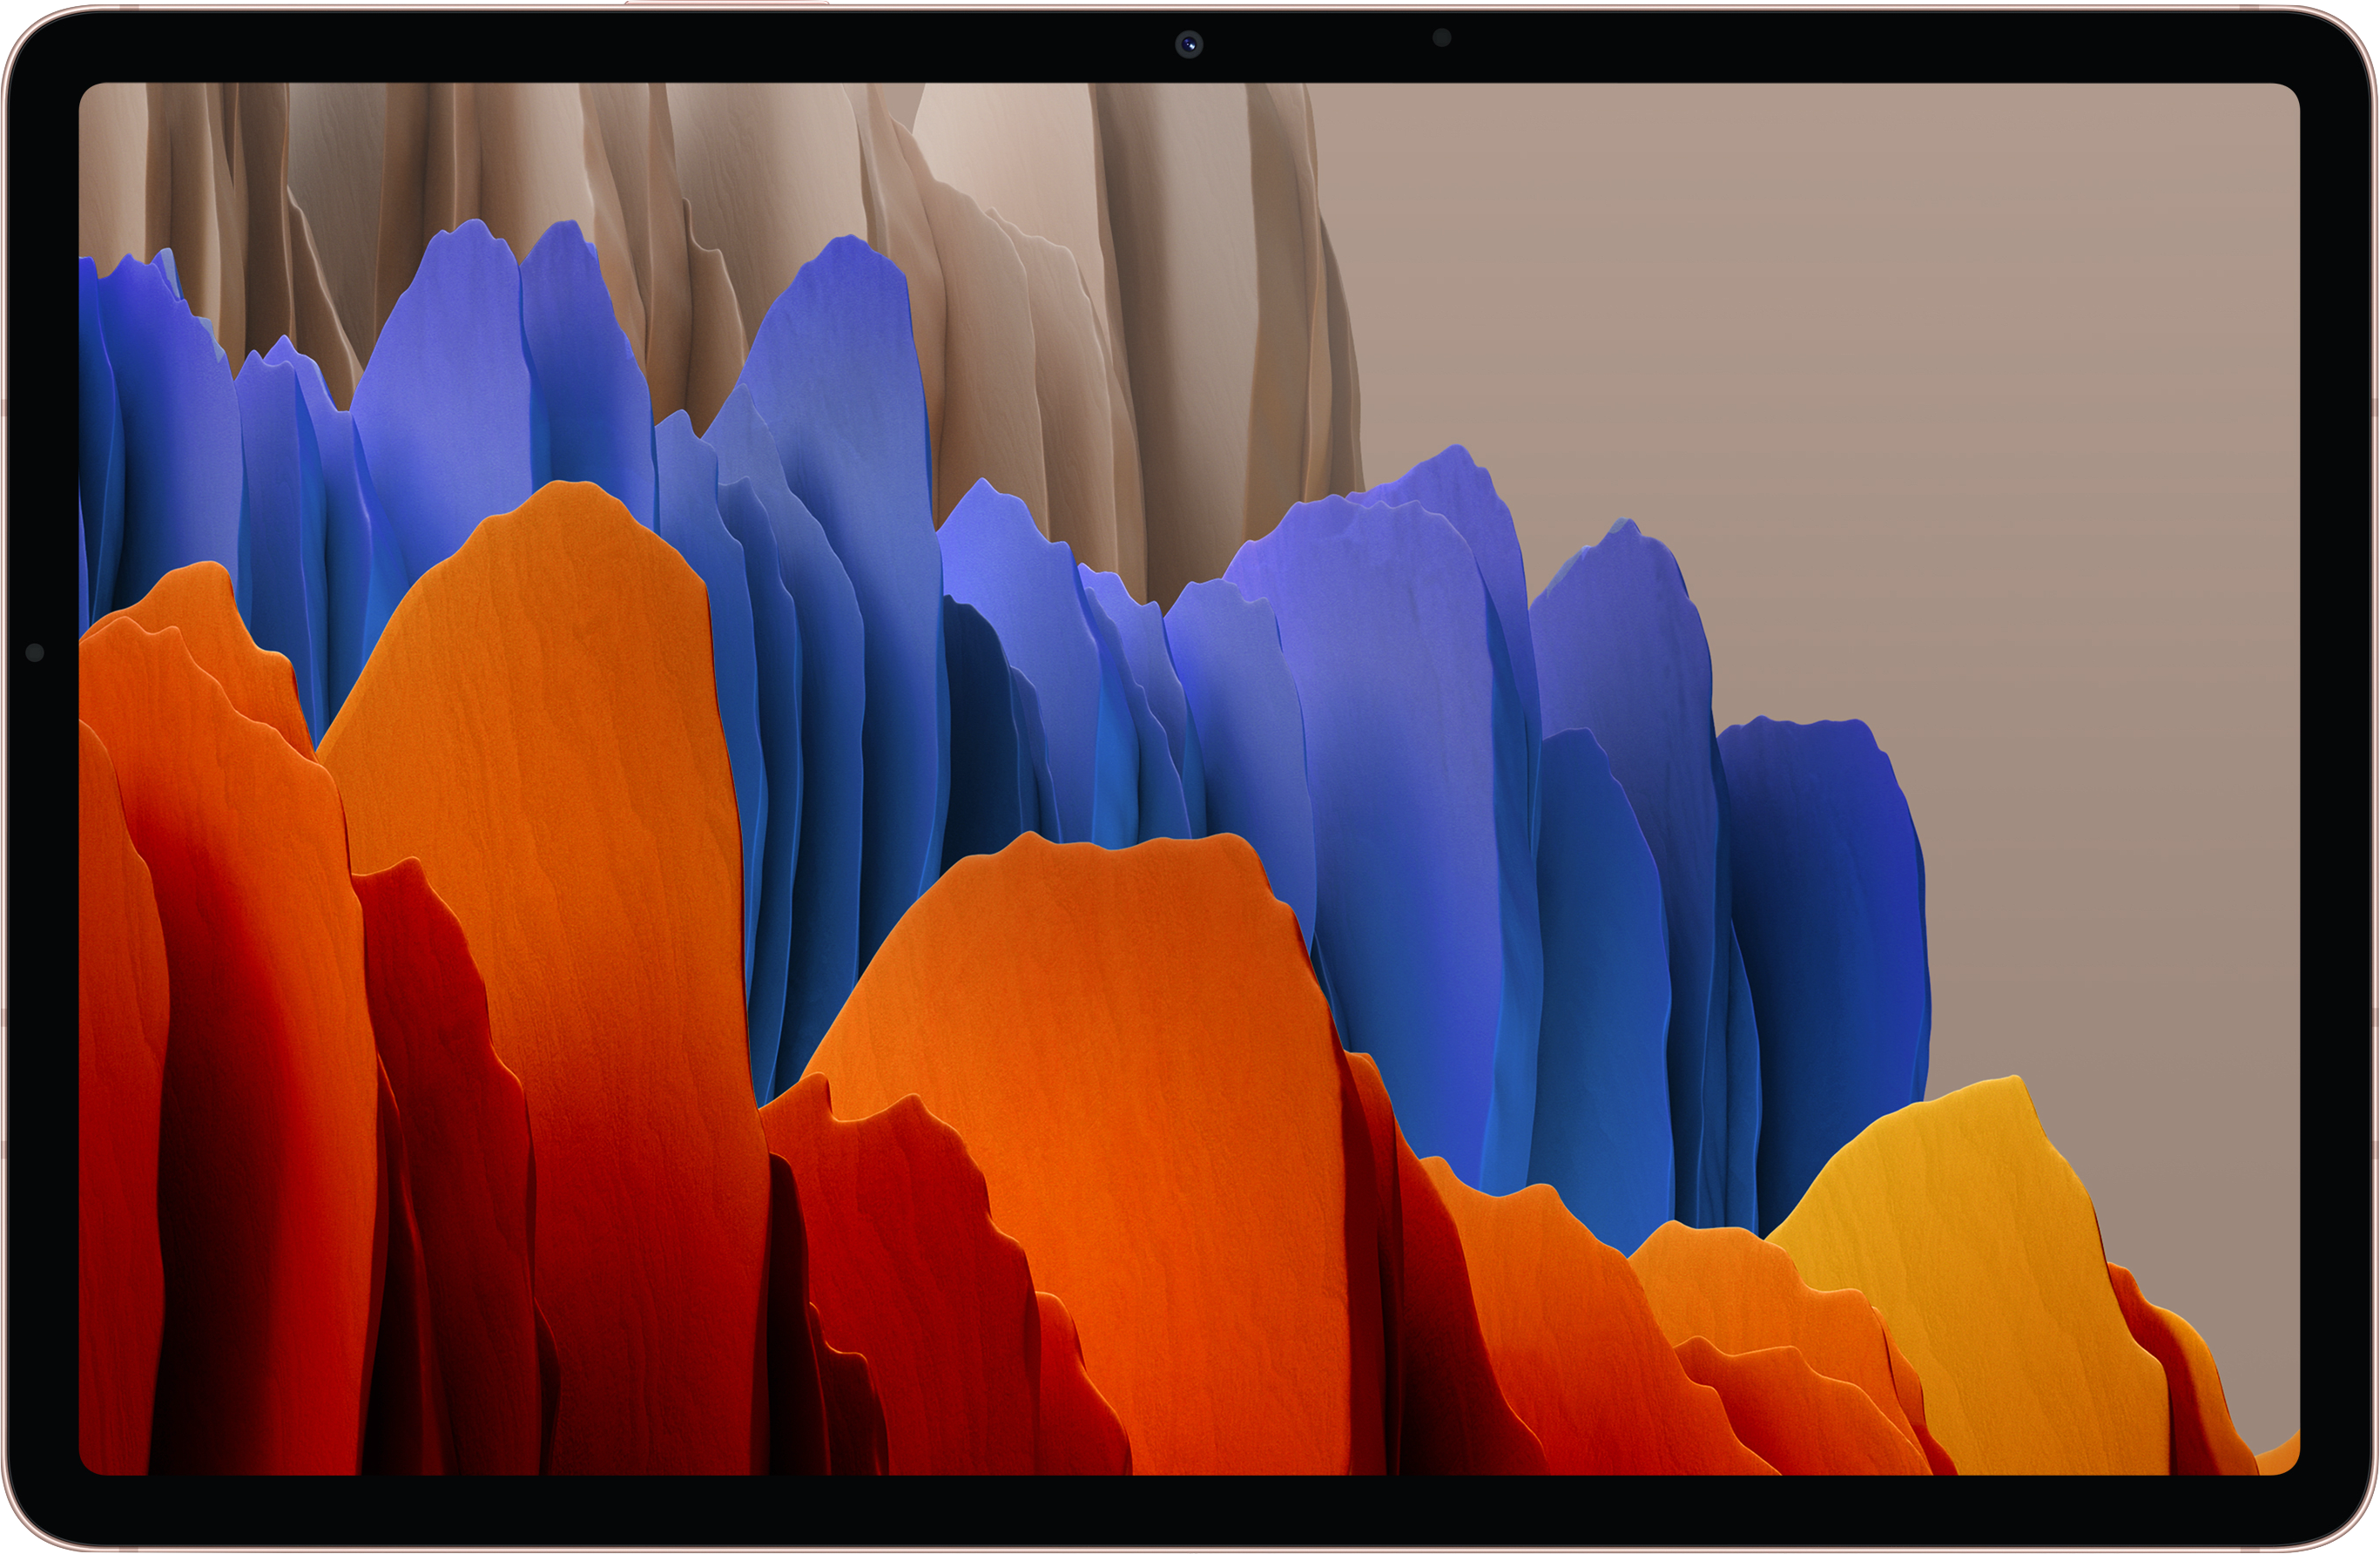 Samsung Tablet Galaxy Tab S7 (2020) - WiFi - Android™ 10 - 128GB